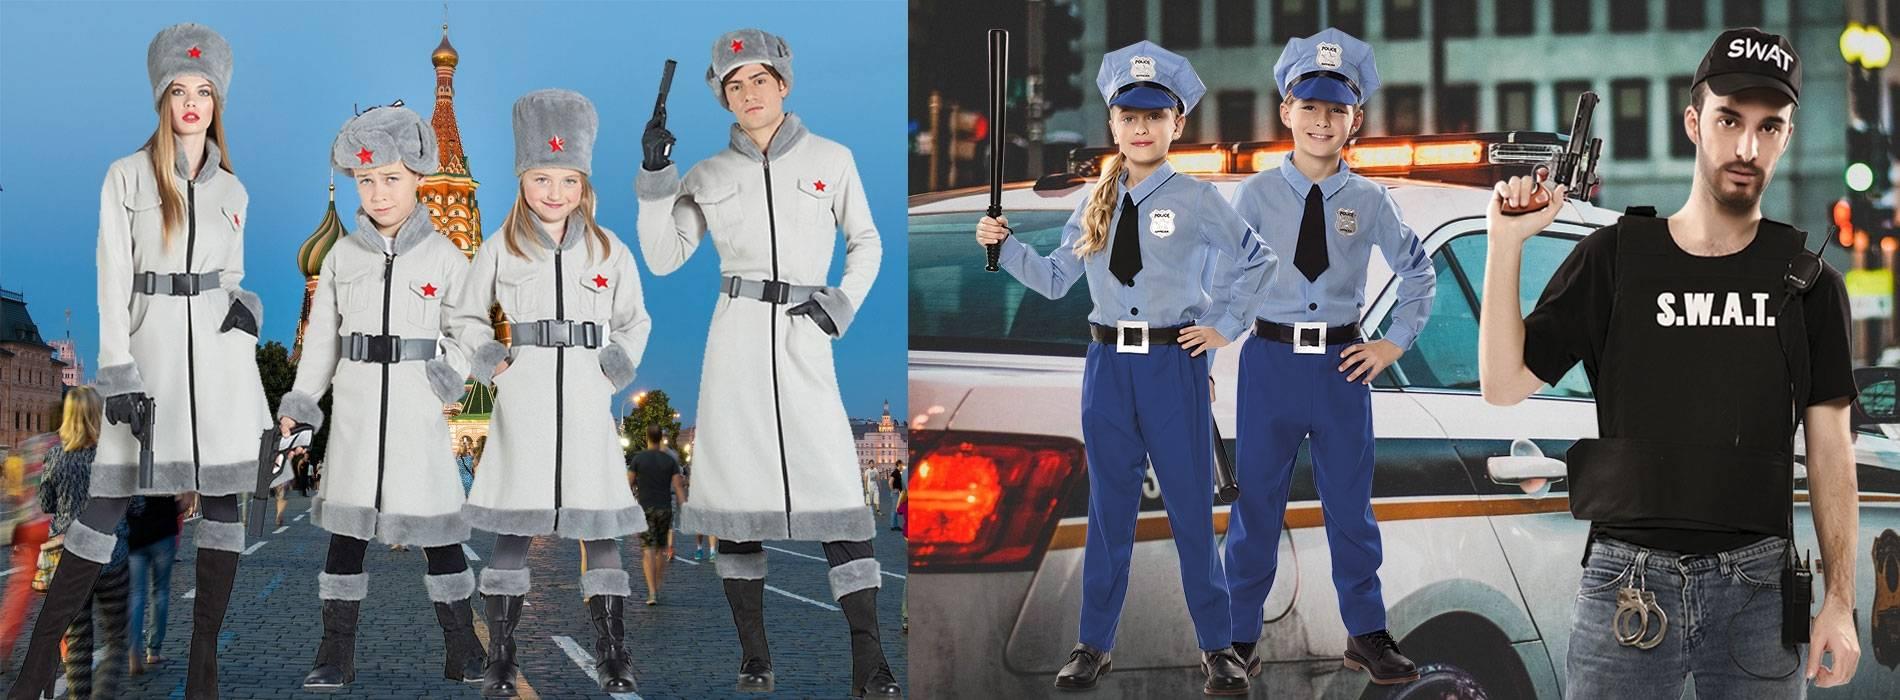 Novos disfarces de espiões e policiais